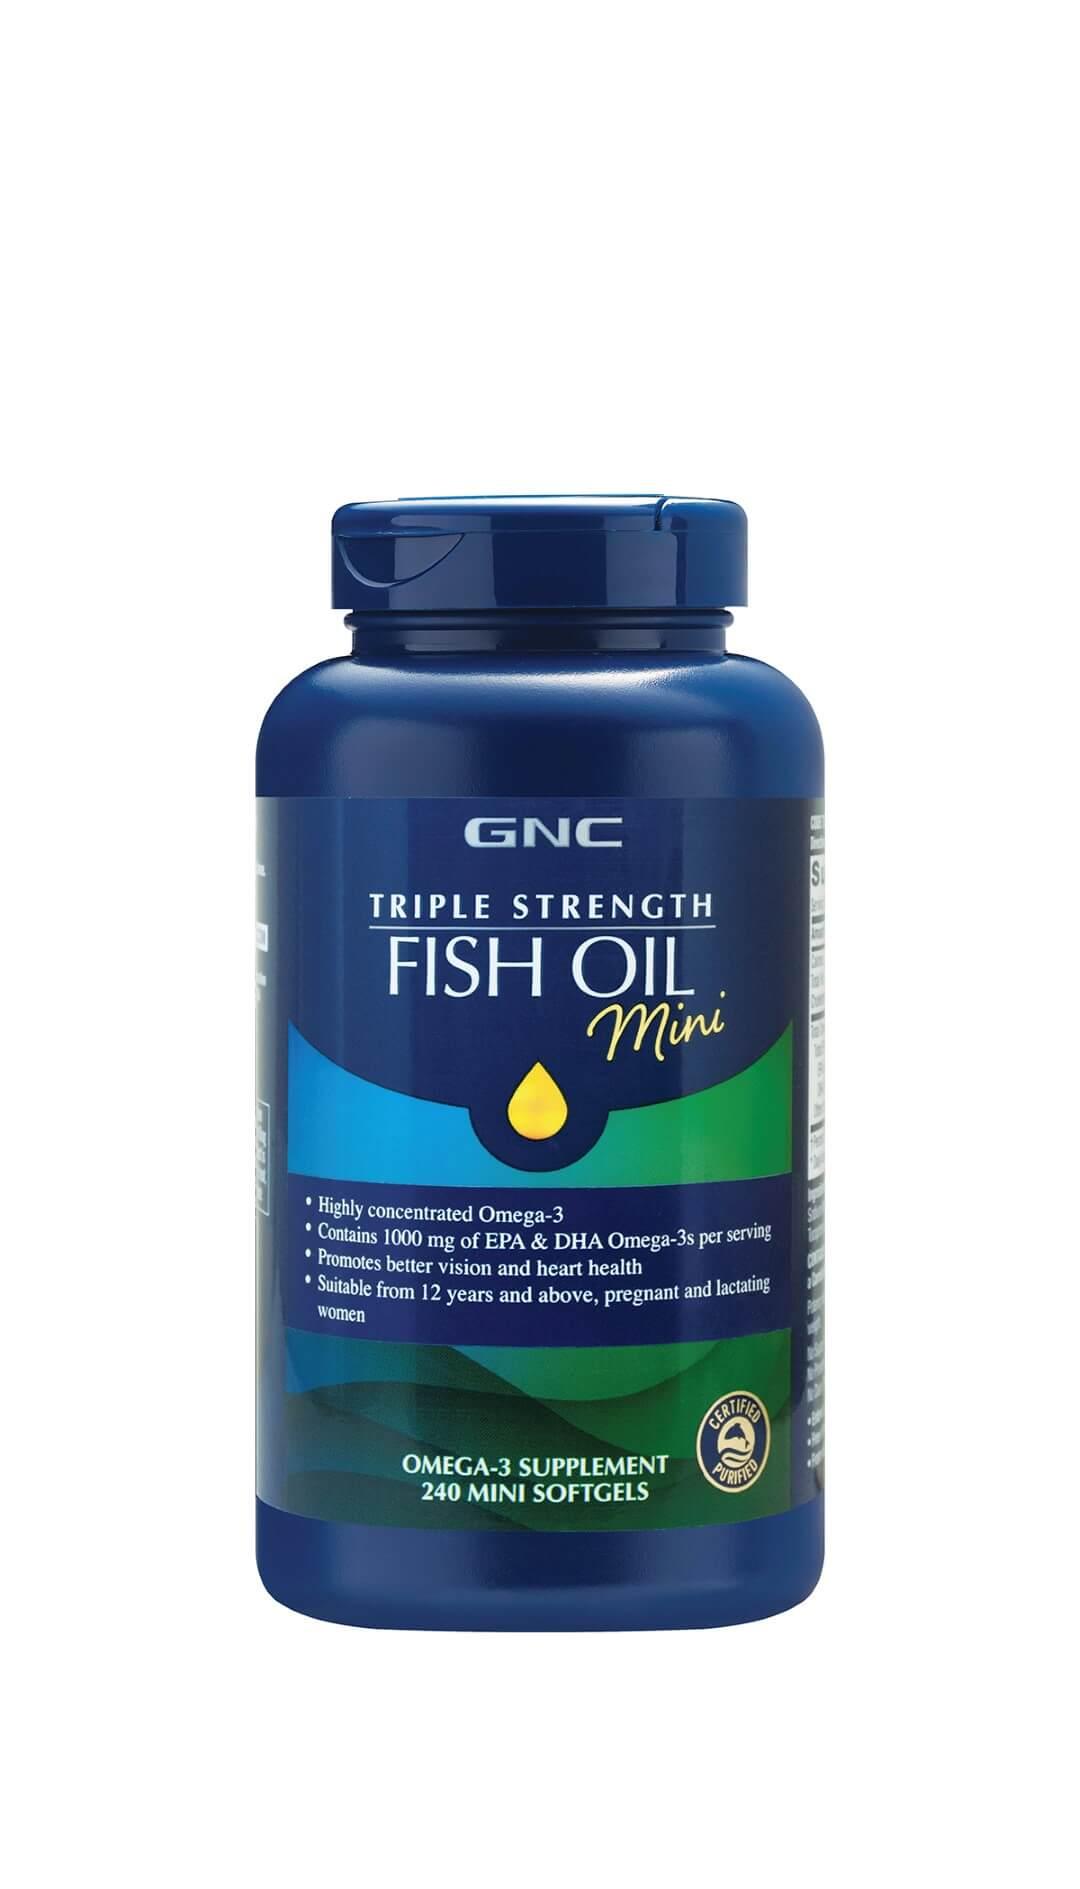 Triple Strength Fish Oil (240 Mini Softgels)